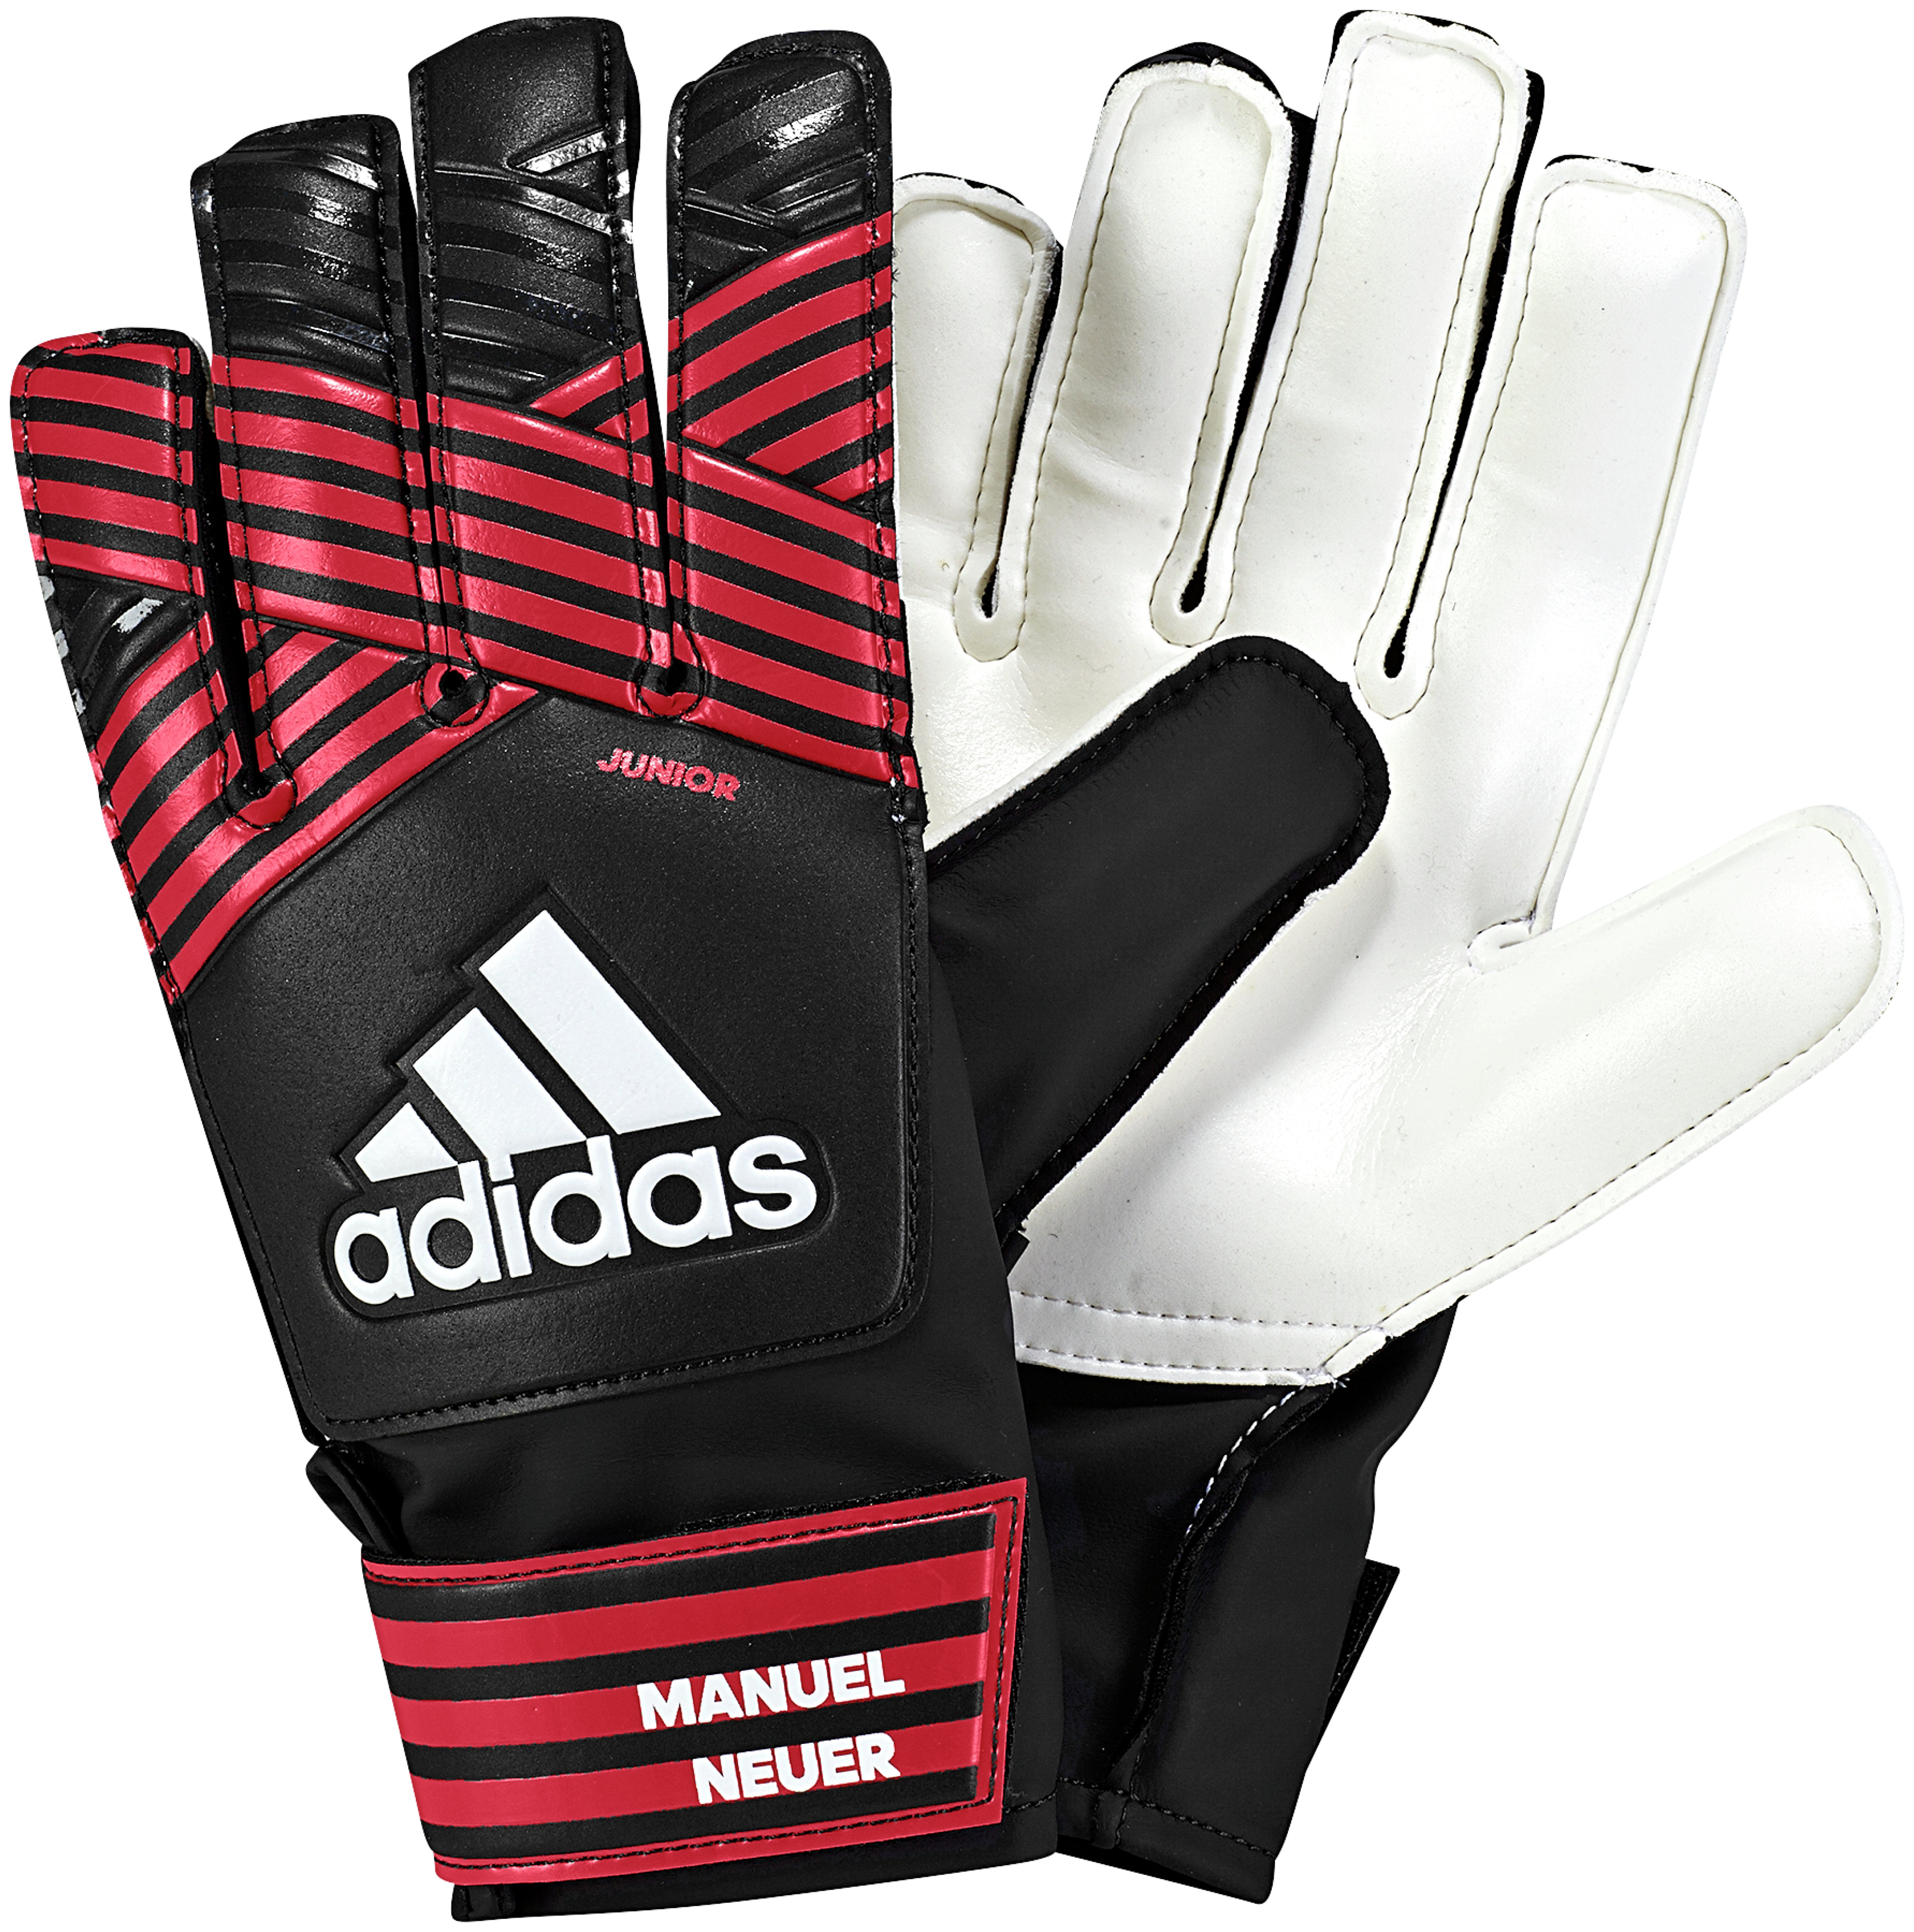 official photos 4871b 39dae Adidas Ace Football Junior Goalkeeper Gloves